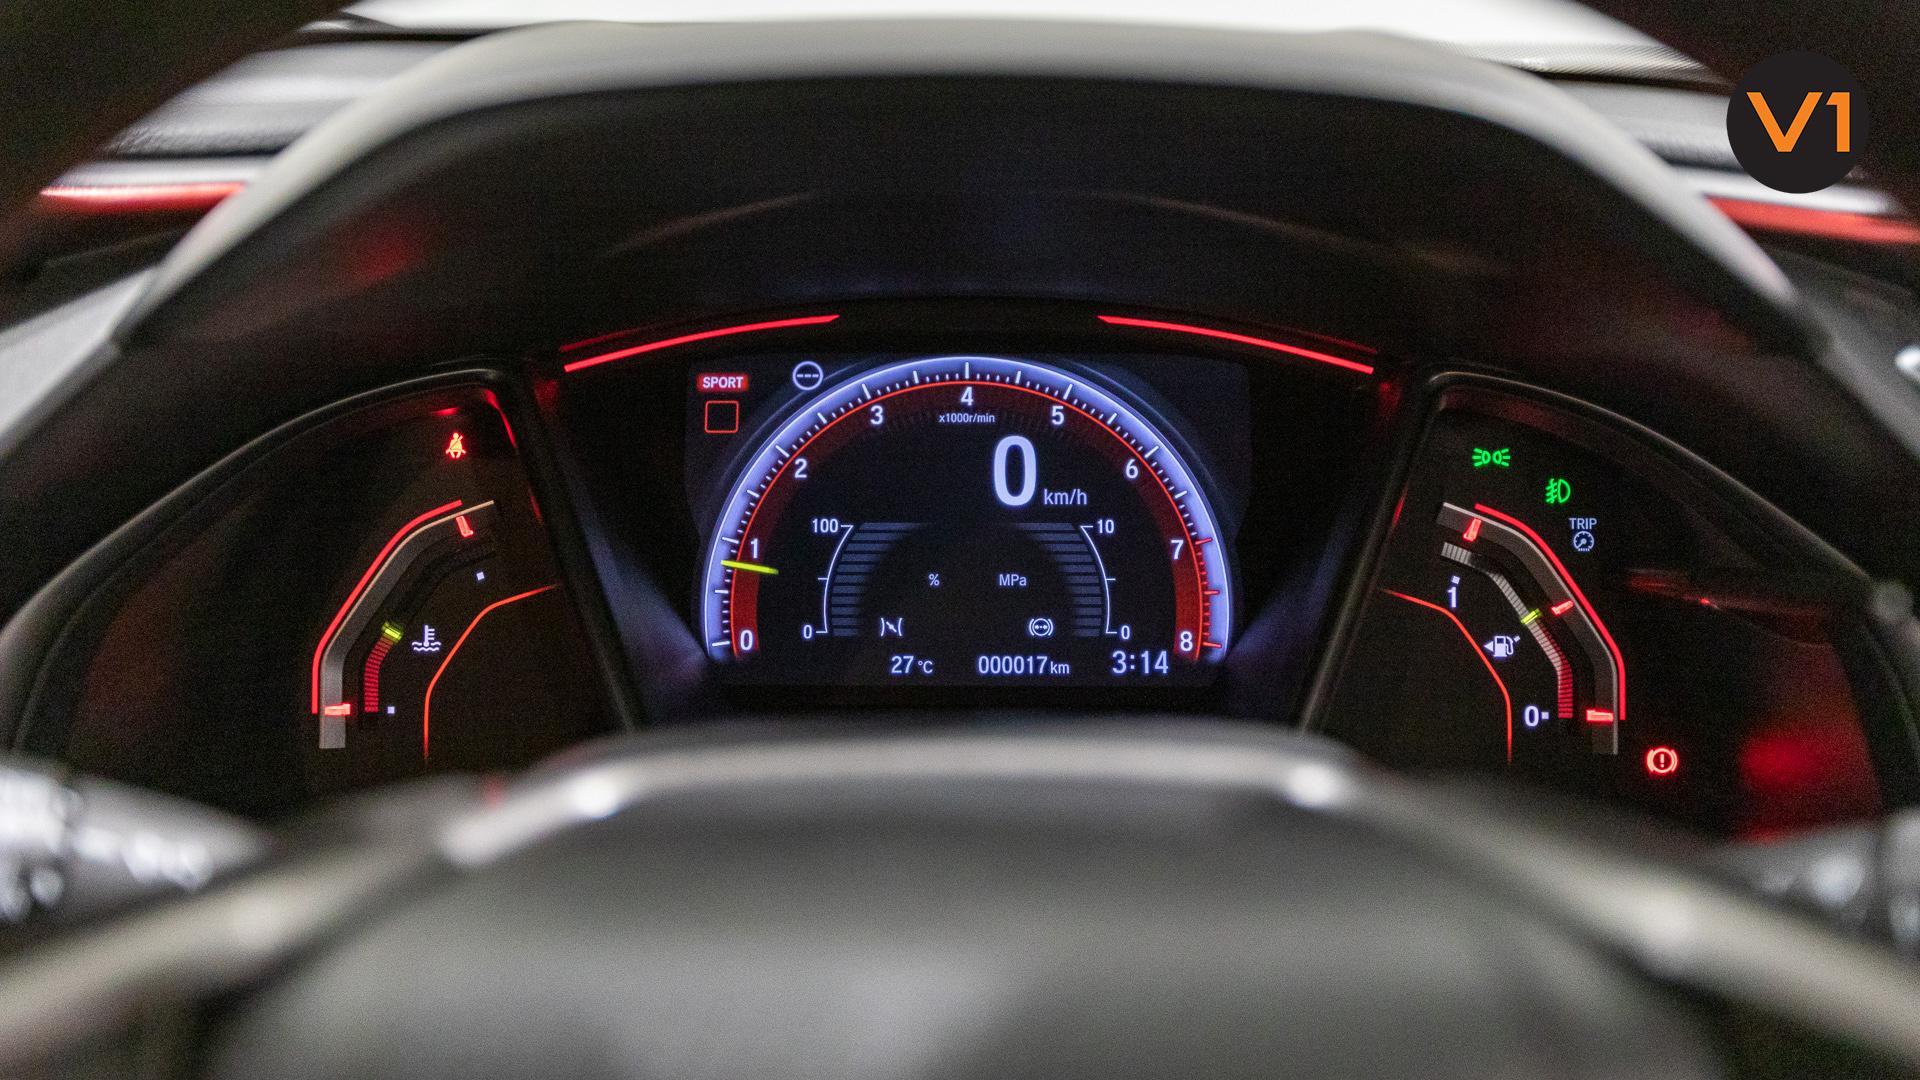 Honda Civic 2.0 Type R GT (FL2020) - Meter Red Illumination